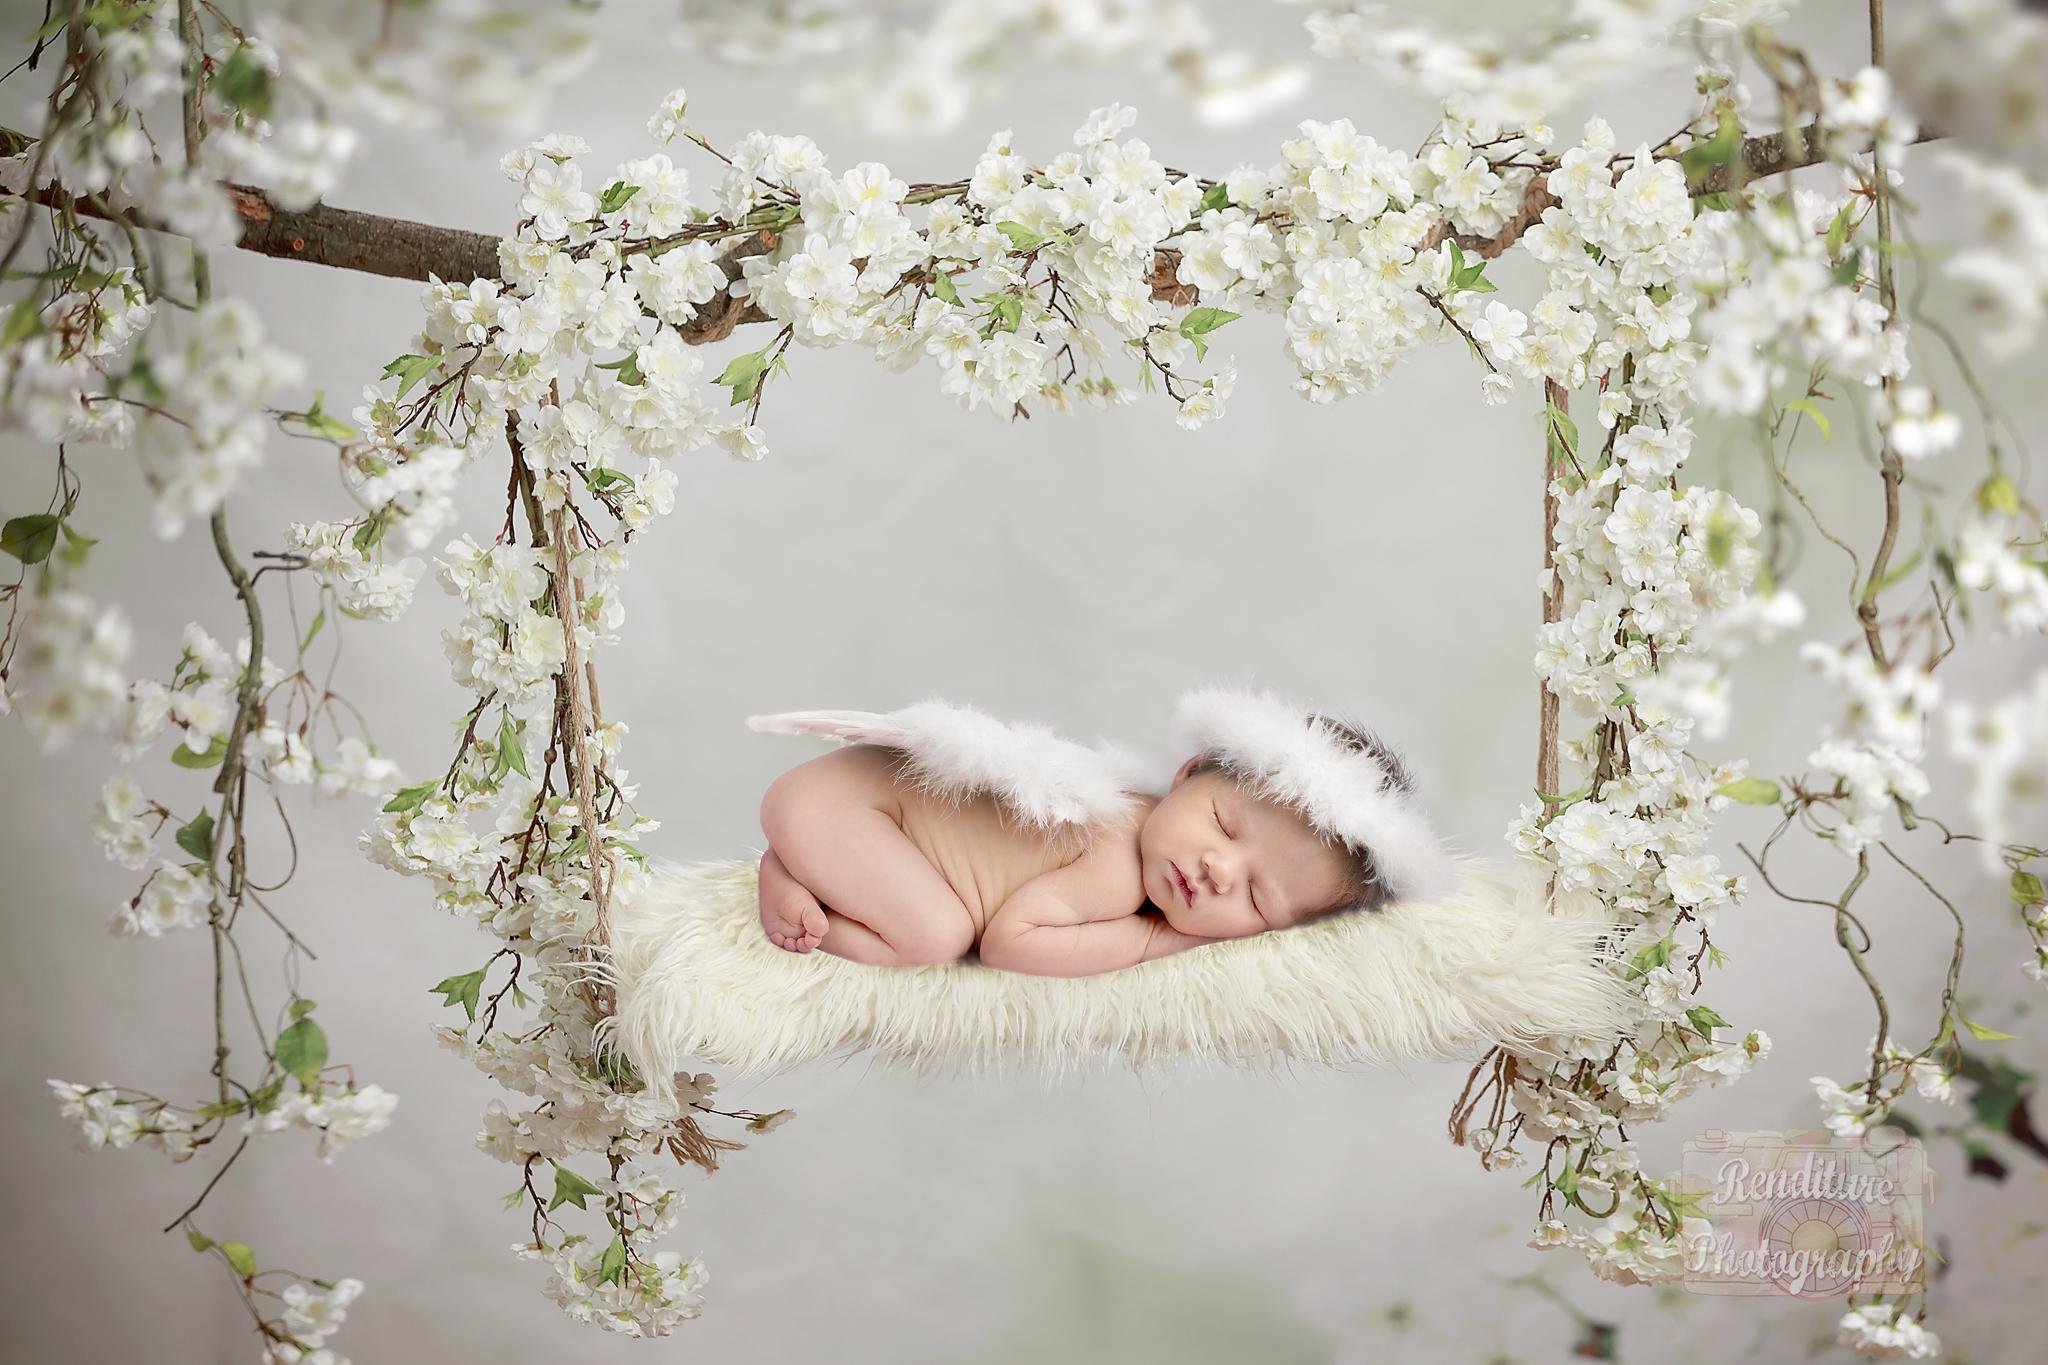 Saskatoon-Newborn-Family-Renditure-Photography-Photographer-Maternity-Pregnancy-Saskatchewan-Baby-618FBR.jpg